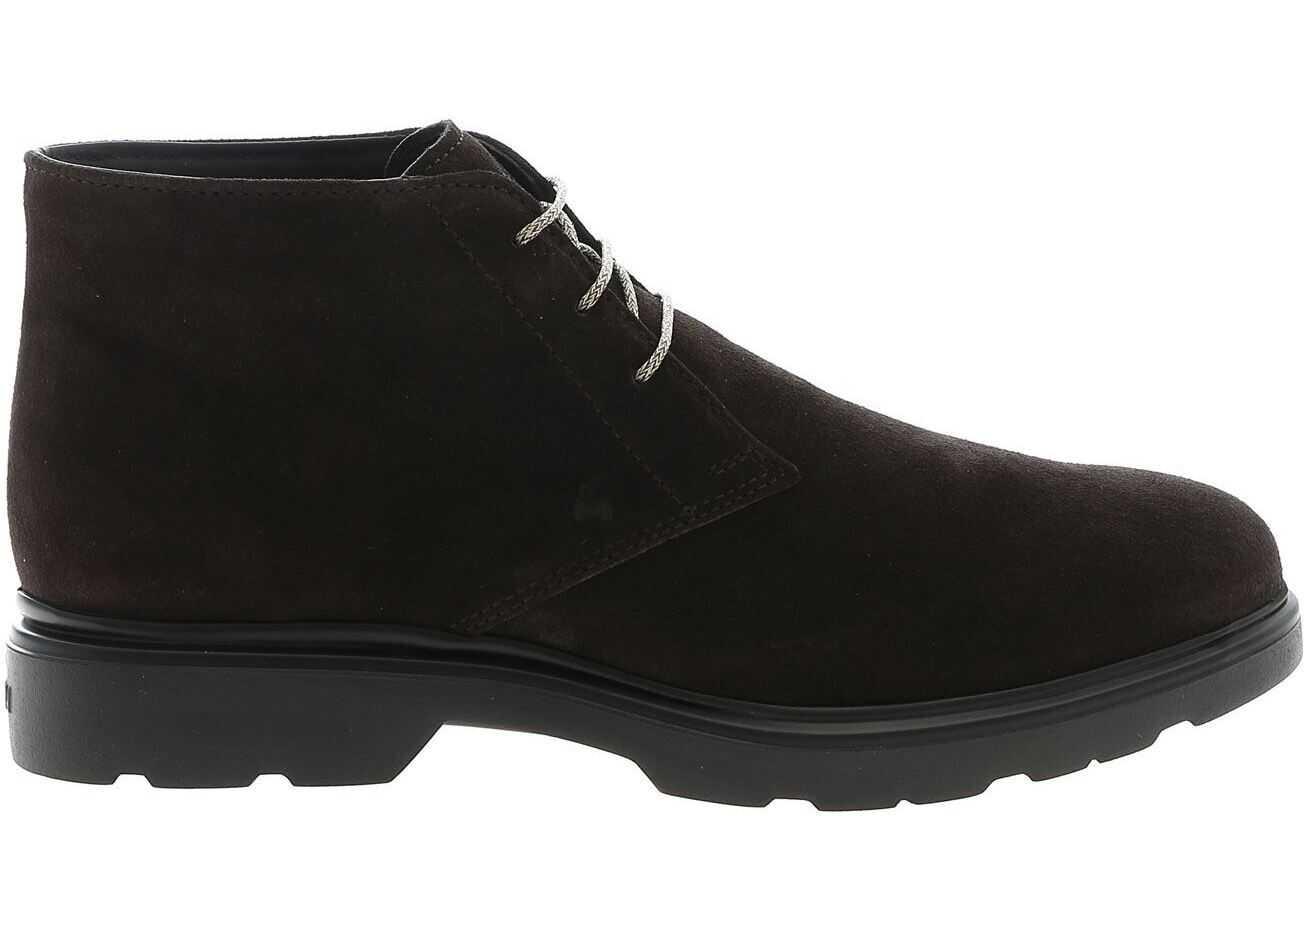 Hogan Desert H393 Shoes In Brown HXM3930W352HG0S807 Brown imagine b-mall.ro